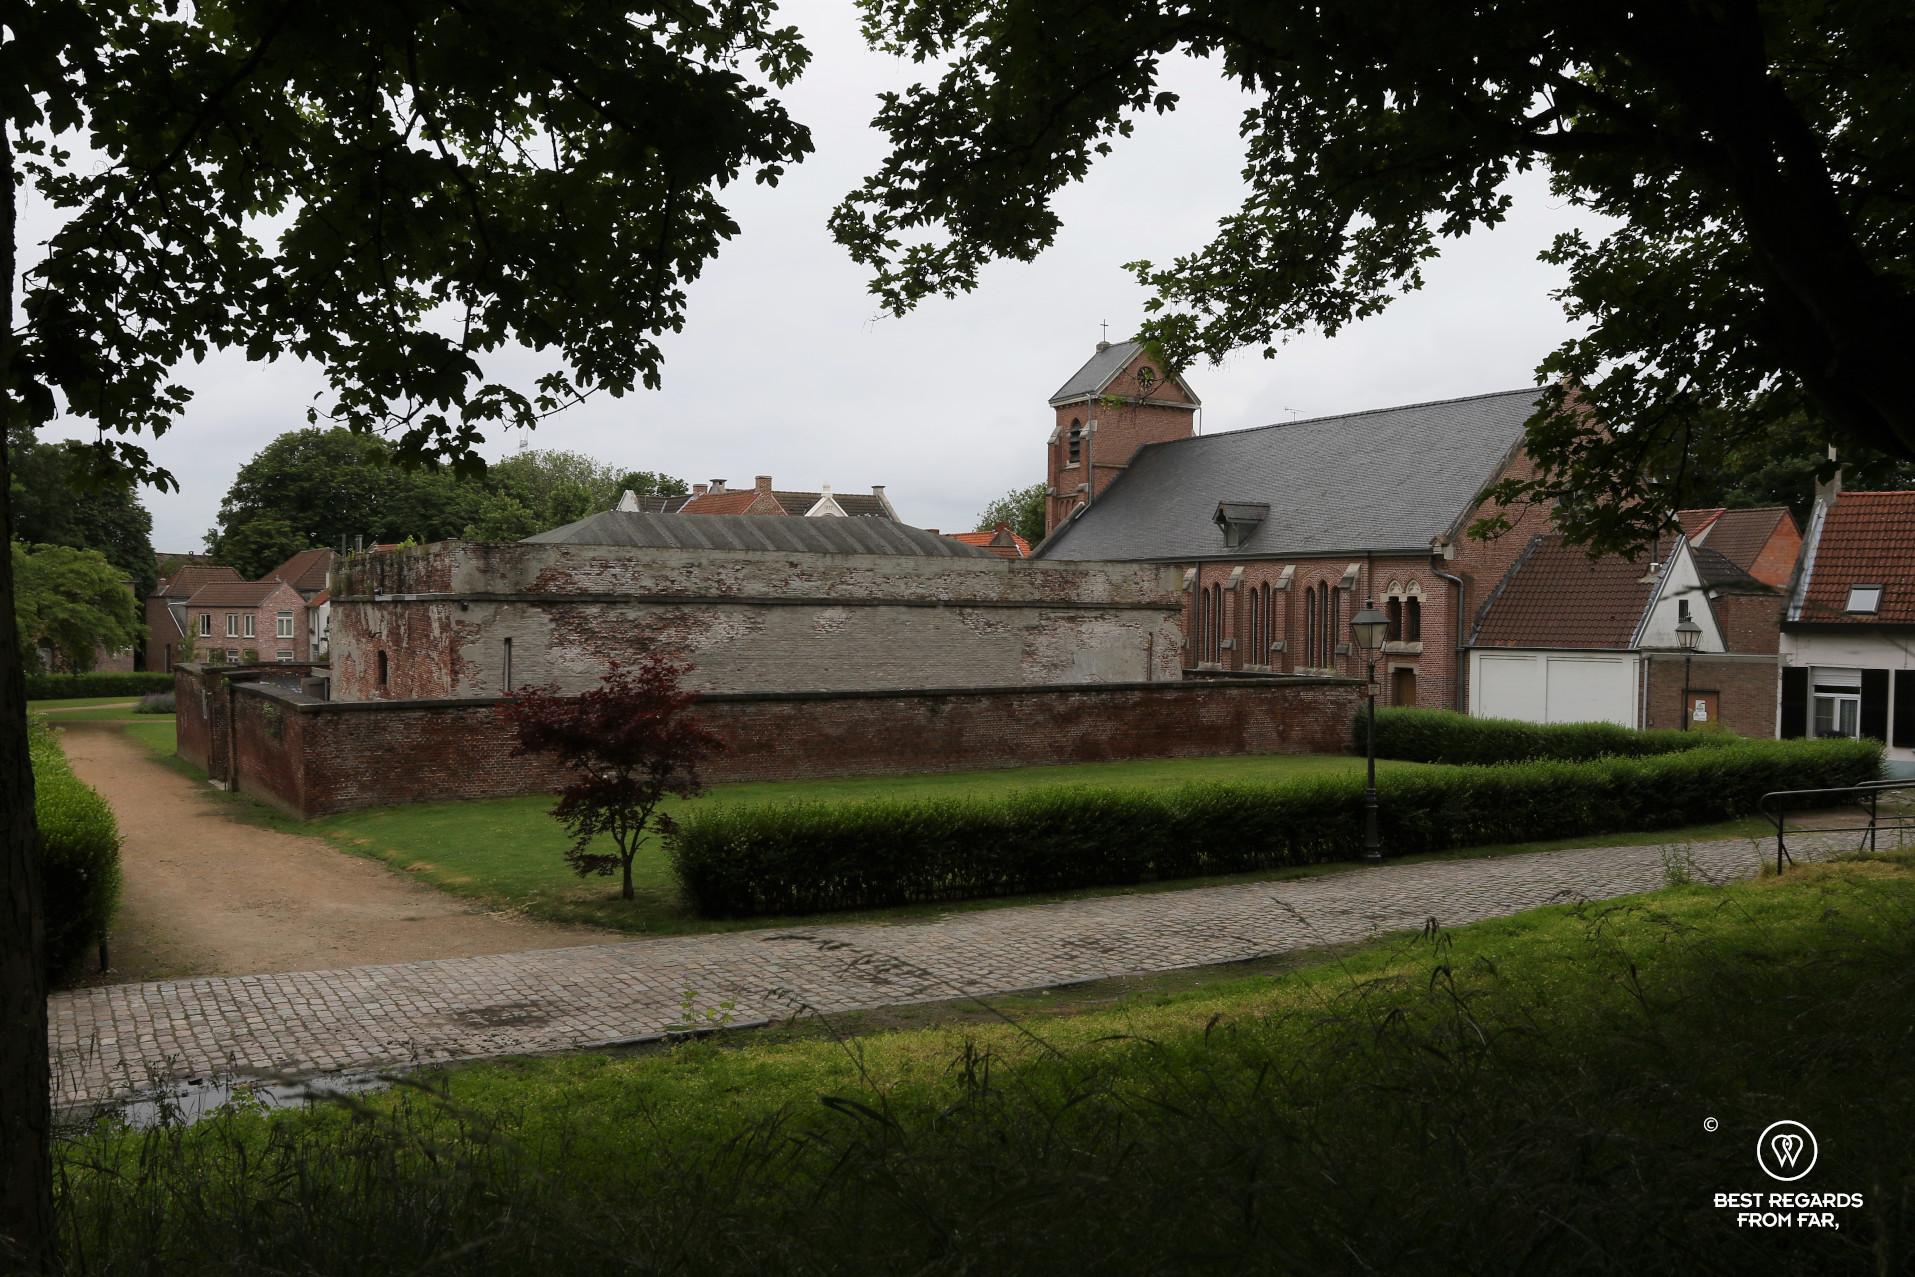 Lillo Fort and church, Antwerp, Belgium